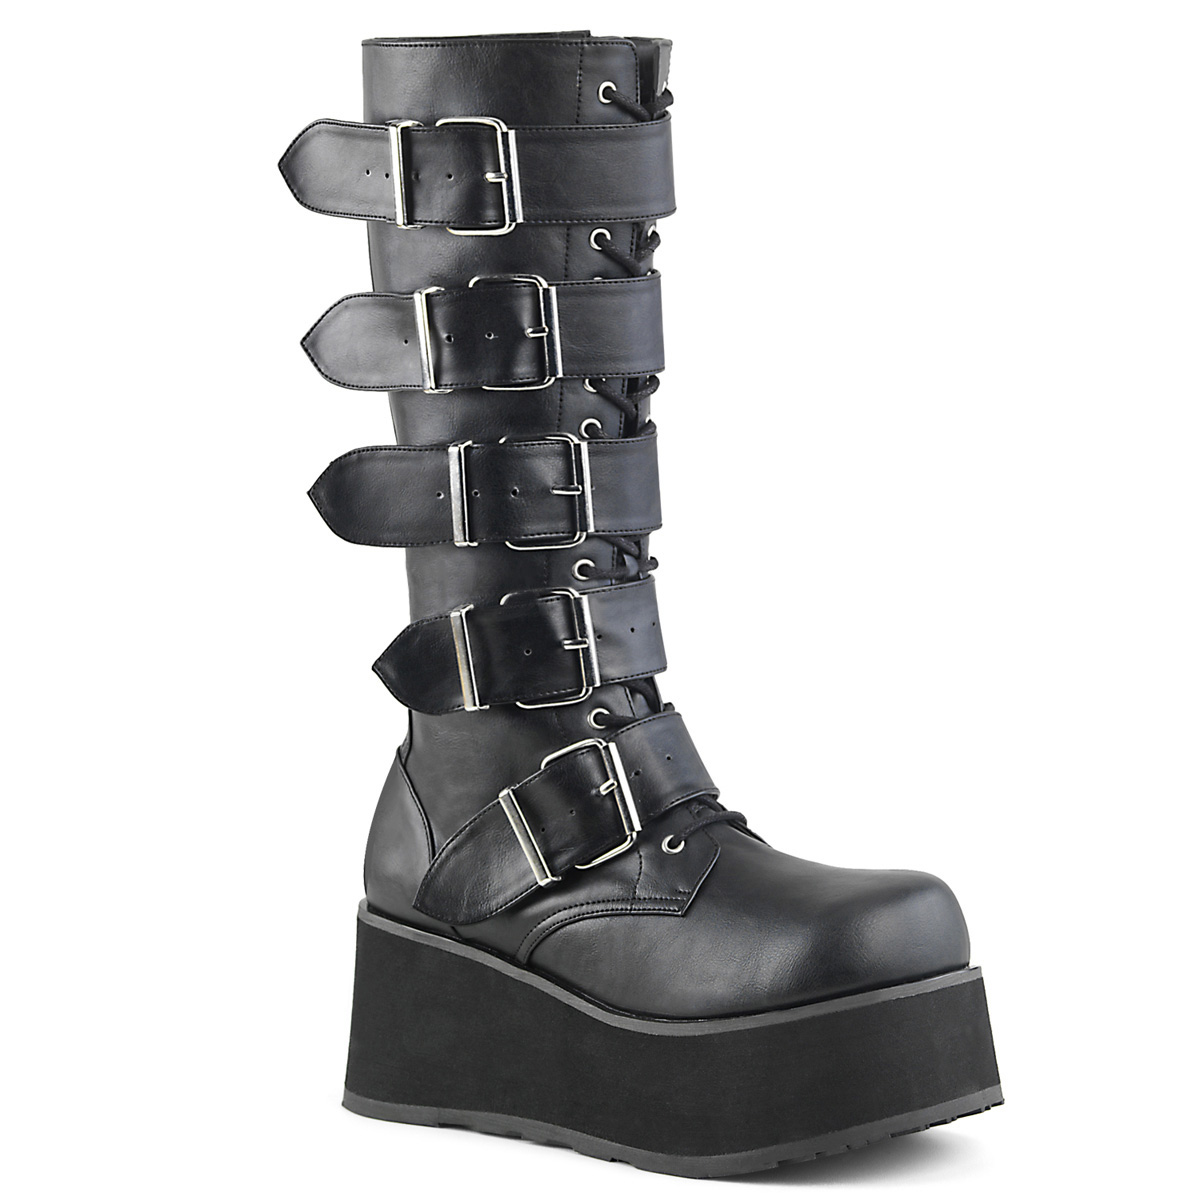 68e163cf054 Gothic Platform Boot TRASHVILLE-518 - PU